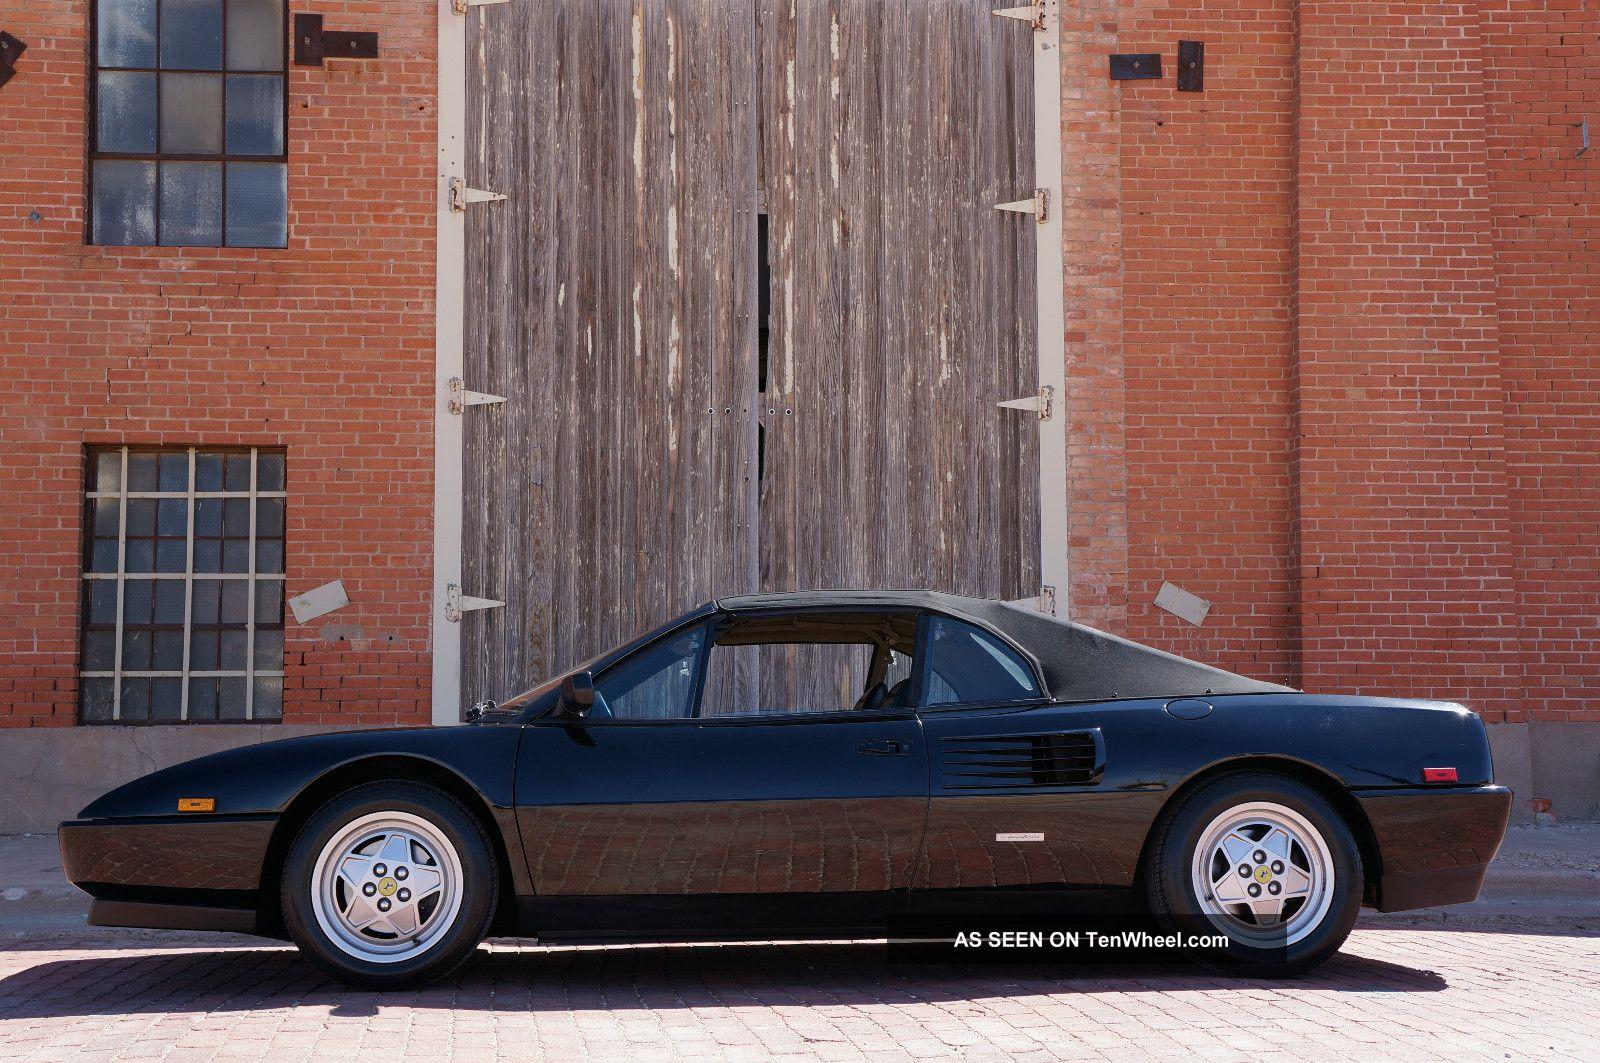 ferrari mondial vs 348 1995 ferrari mondial 348 t air black leather car photo and specs. Black Bedroom Furniture Sets. Home Design Ideas